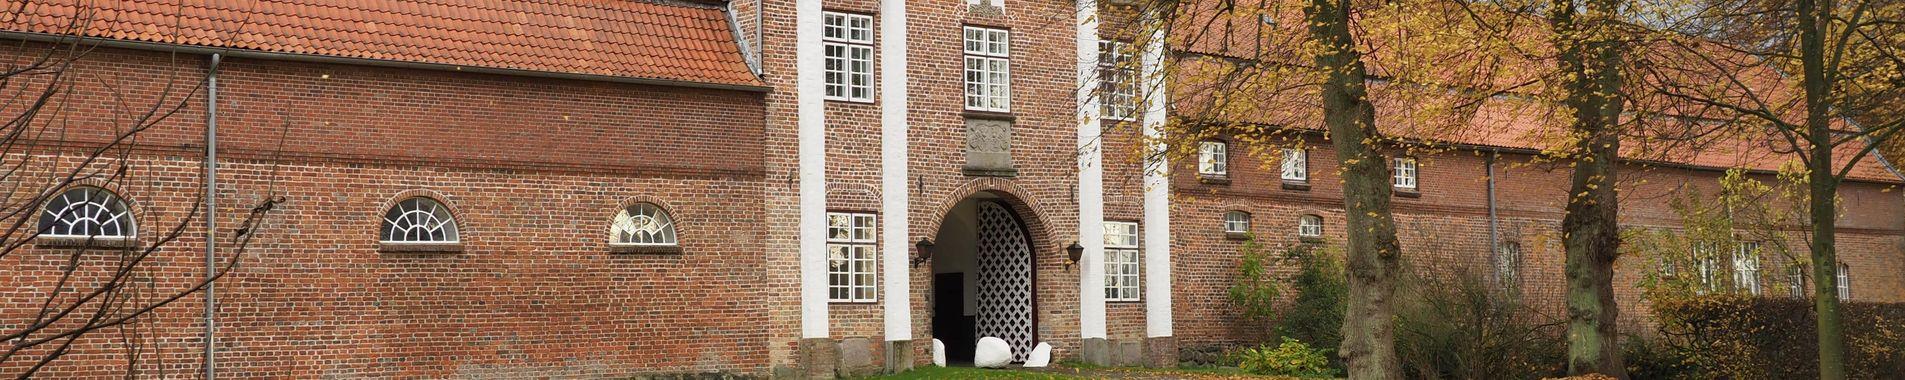 Torhaus Quarnbek